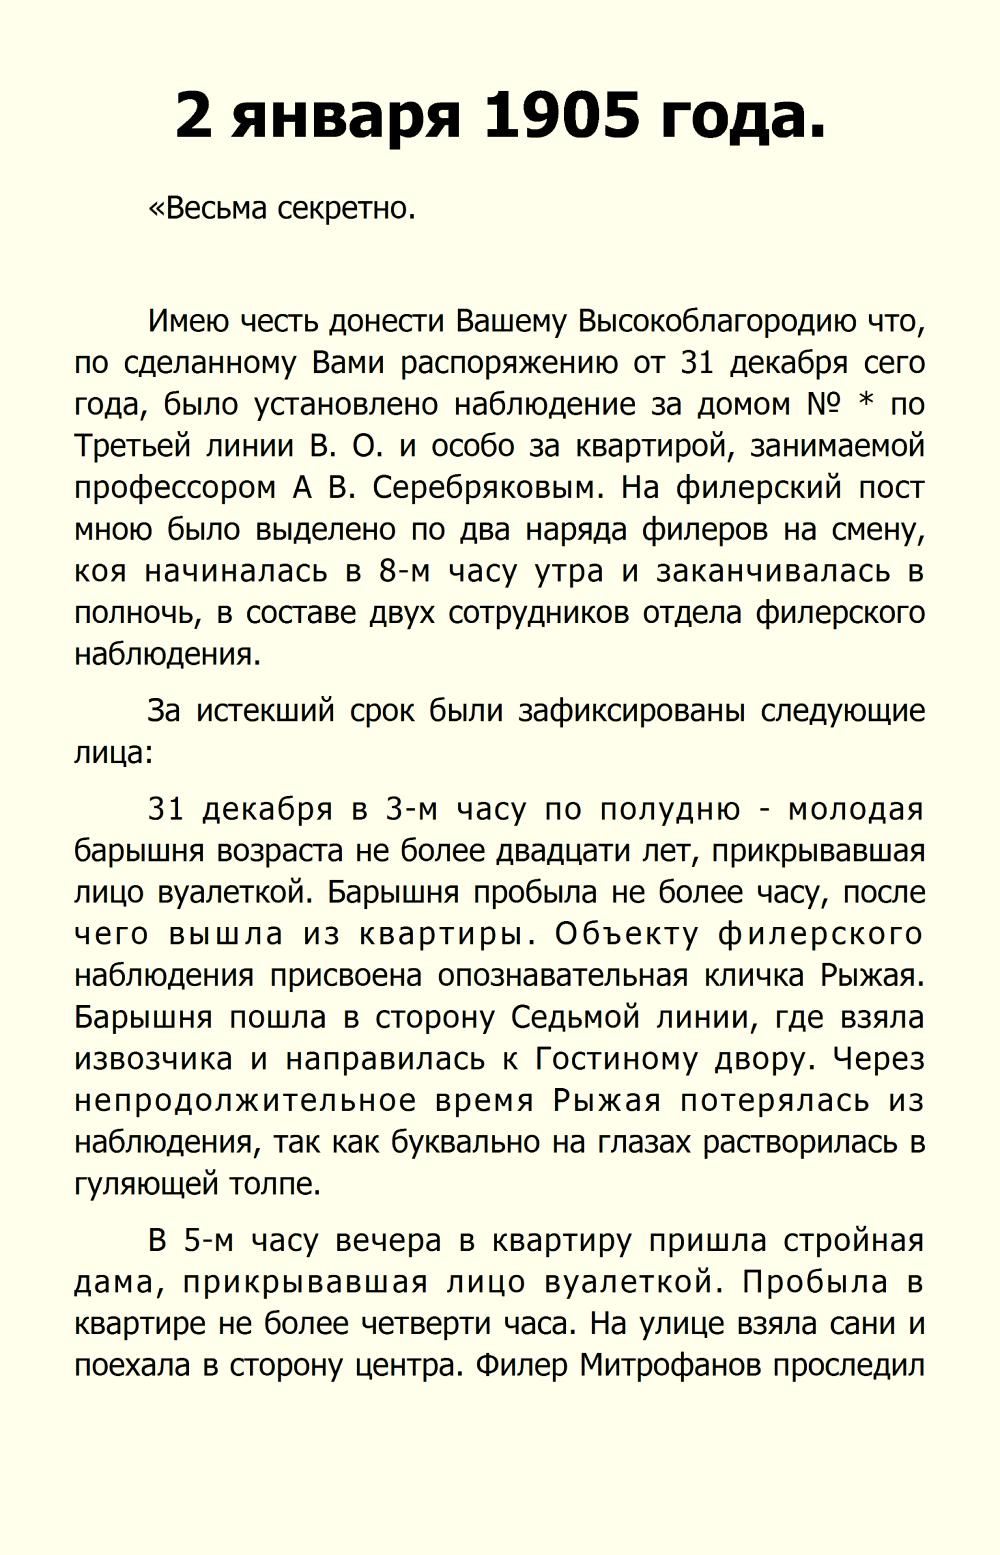 http://i4.imageban.ru/out/2013/11/29/3ffe4bb5920f200e54760d2bb76fa9ce.jpg